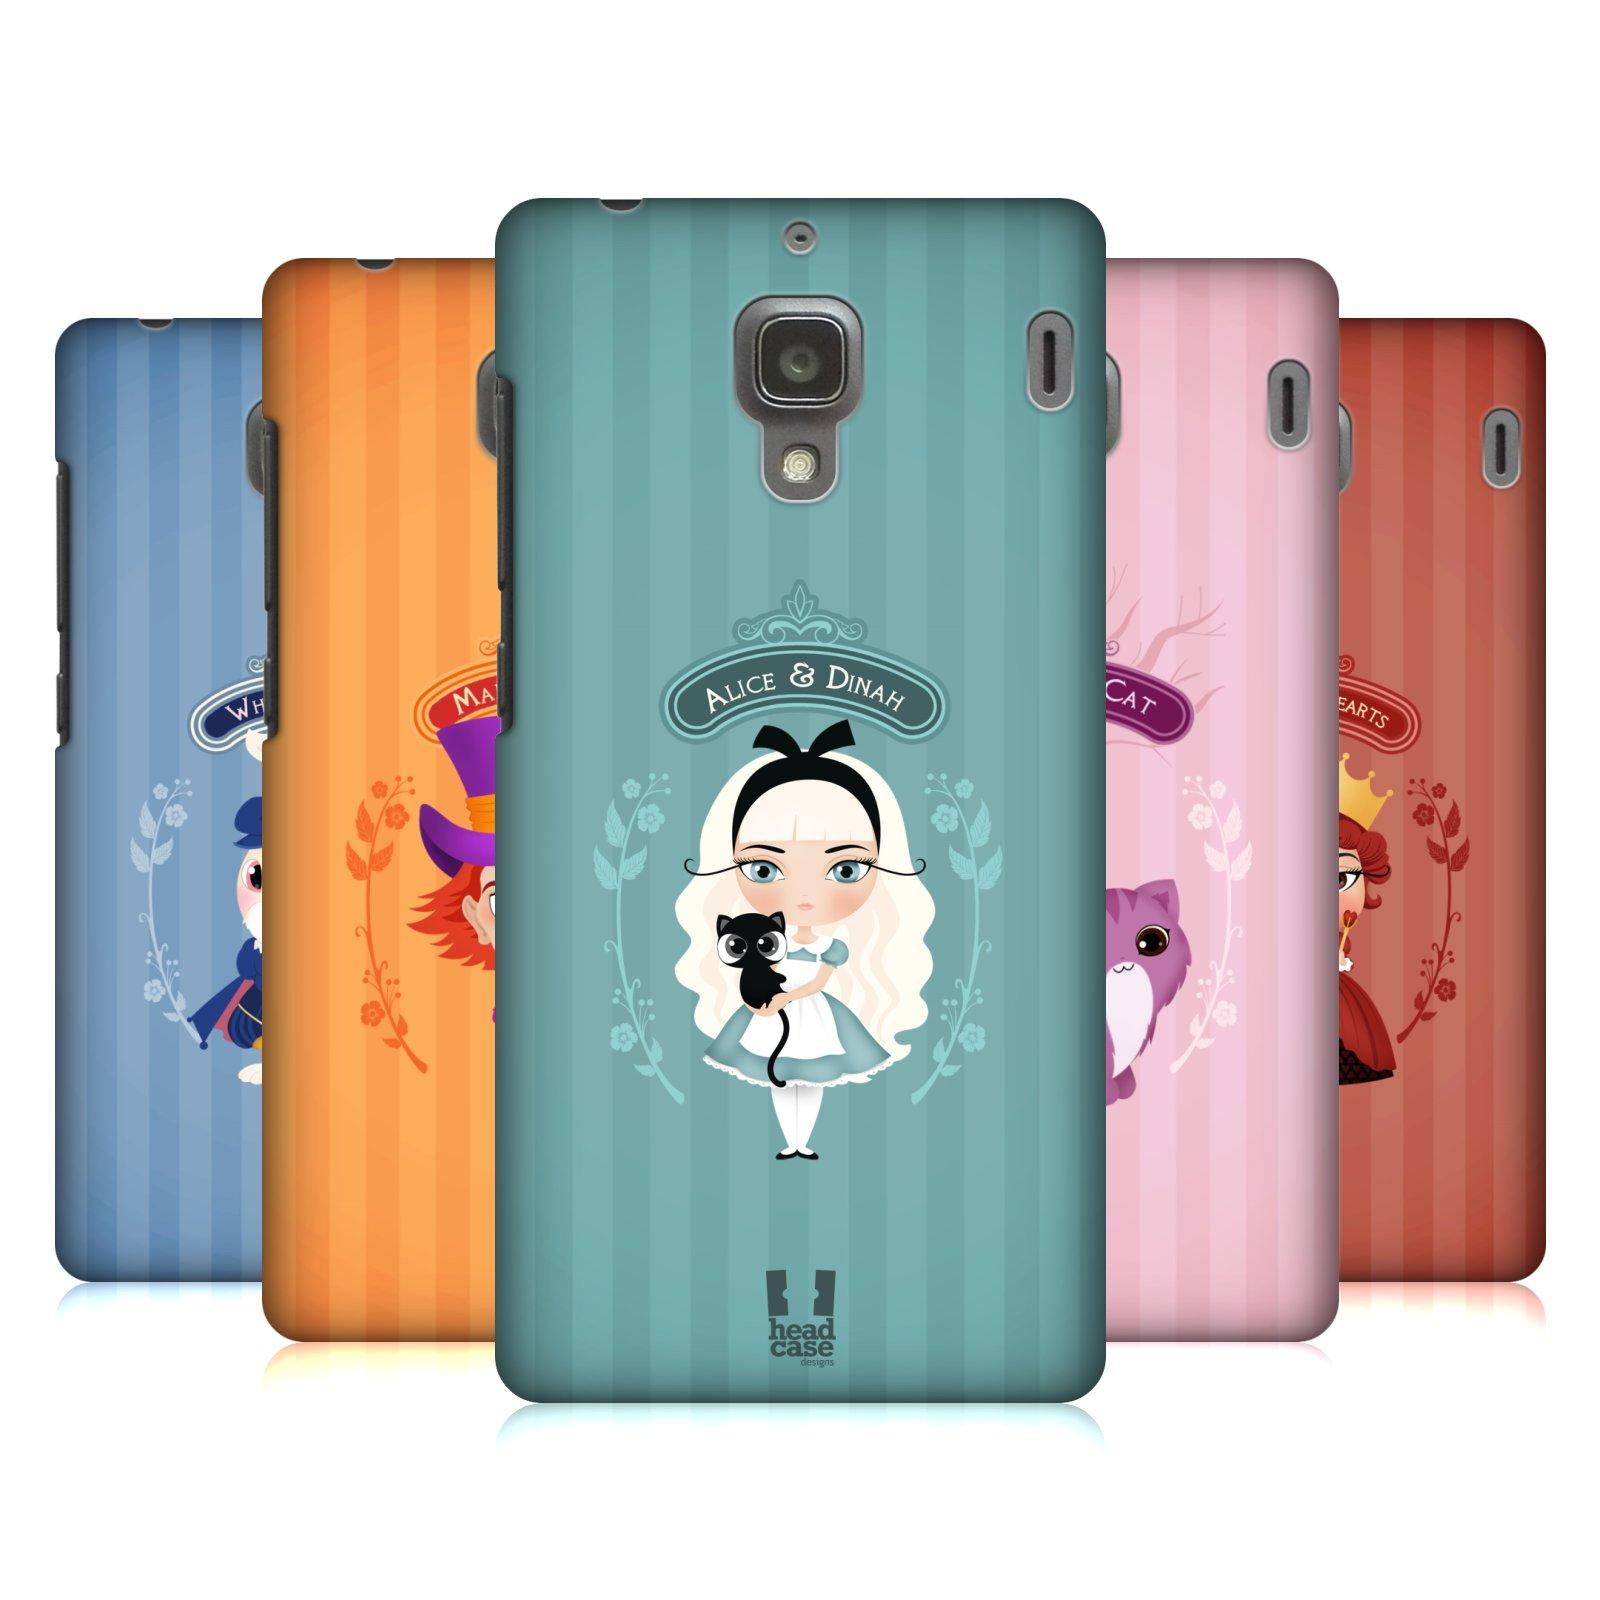 HEAD CASE DESIGNS ALICE IN WONDERLAND HARD BACK CASE FOR XIAOMI PHONES